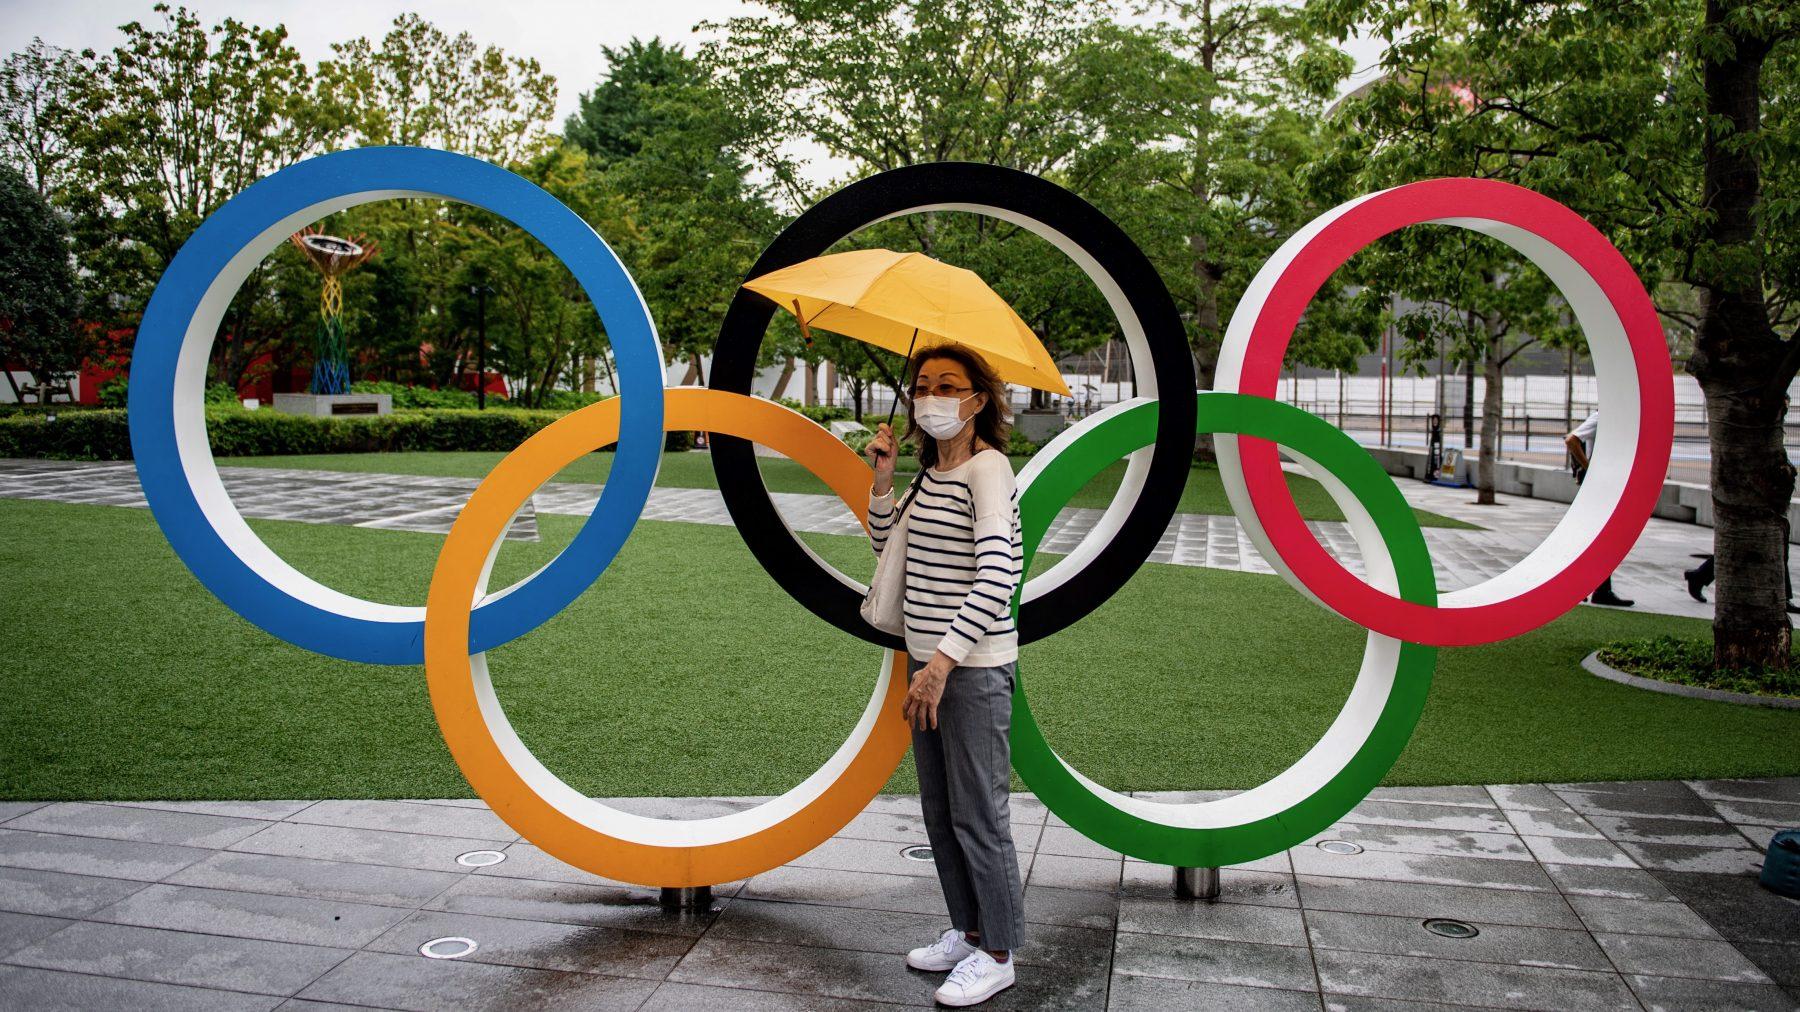 olympisch spelen tokio, corona, olympisch dorp